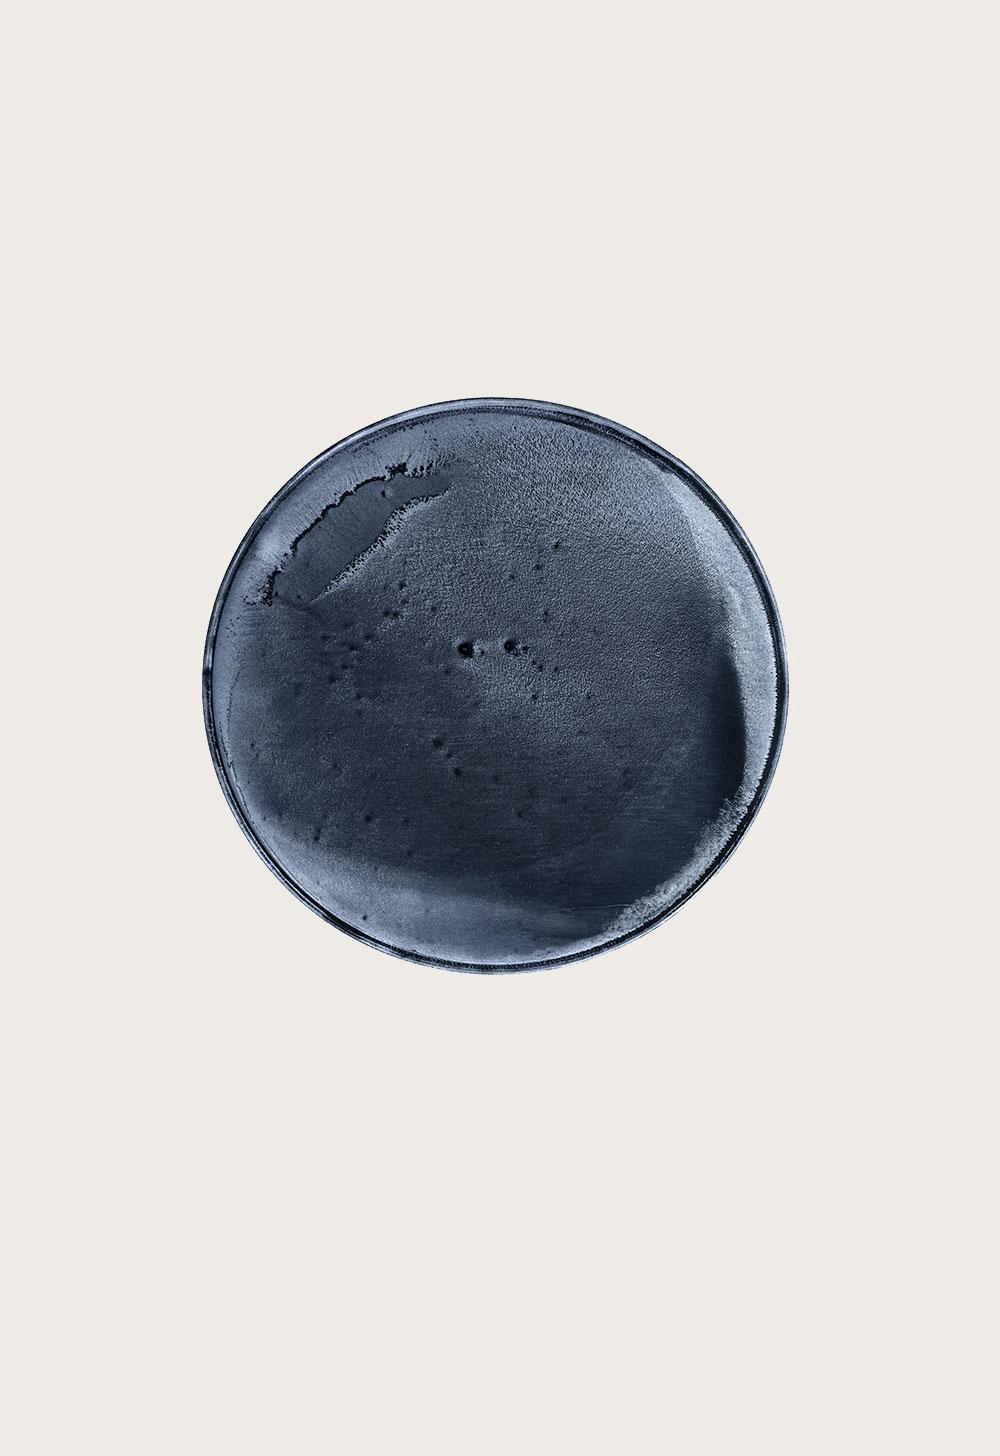 THIS IS NOW –indigo (I) 2010  pigment dispersal on 100% cotton fibre  101.0 x 73.7 cm,Ø 36.6 cm